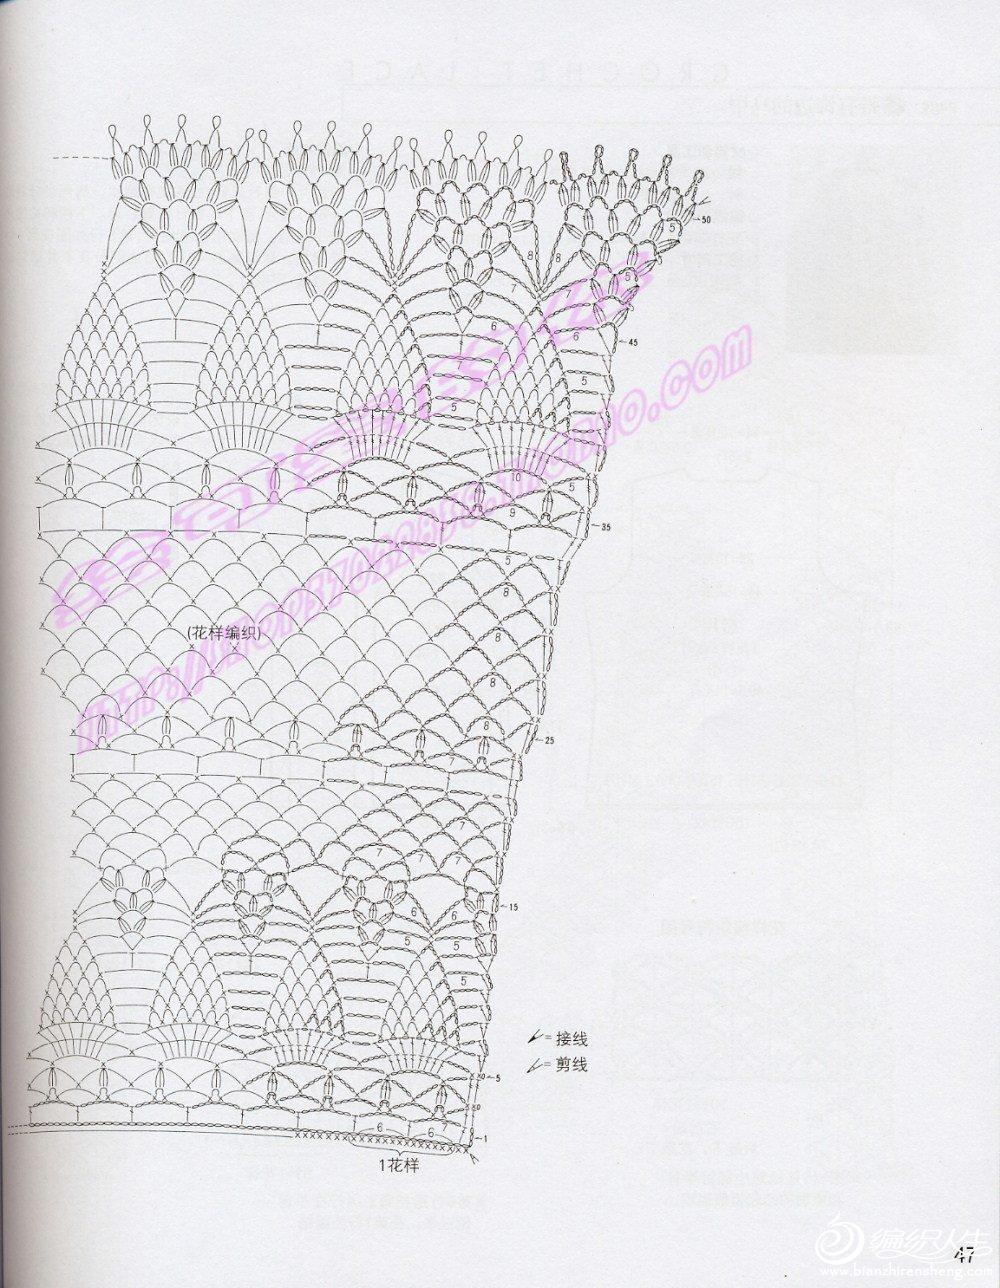 68cd9811gbf5c7e2a6303&690.jpg